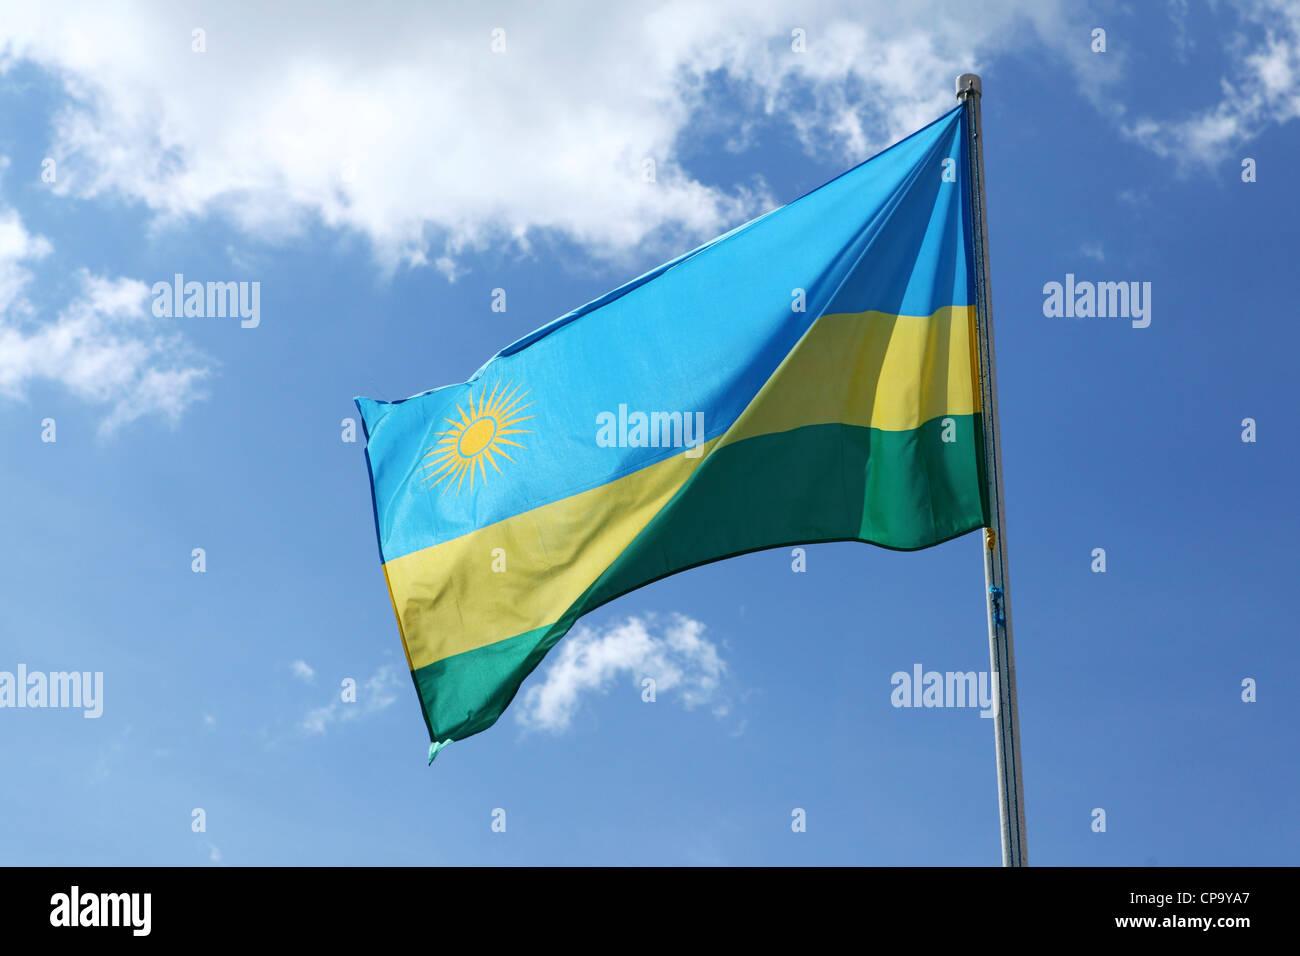 The national flag of Rwanda. - Stock Image